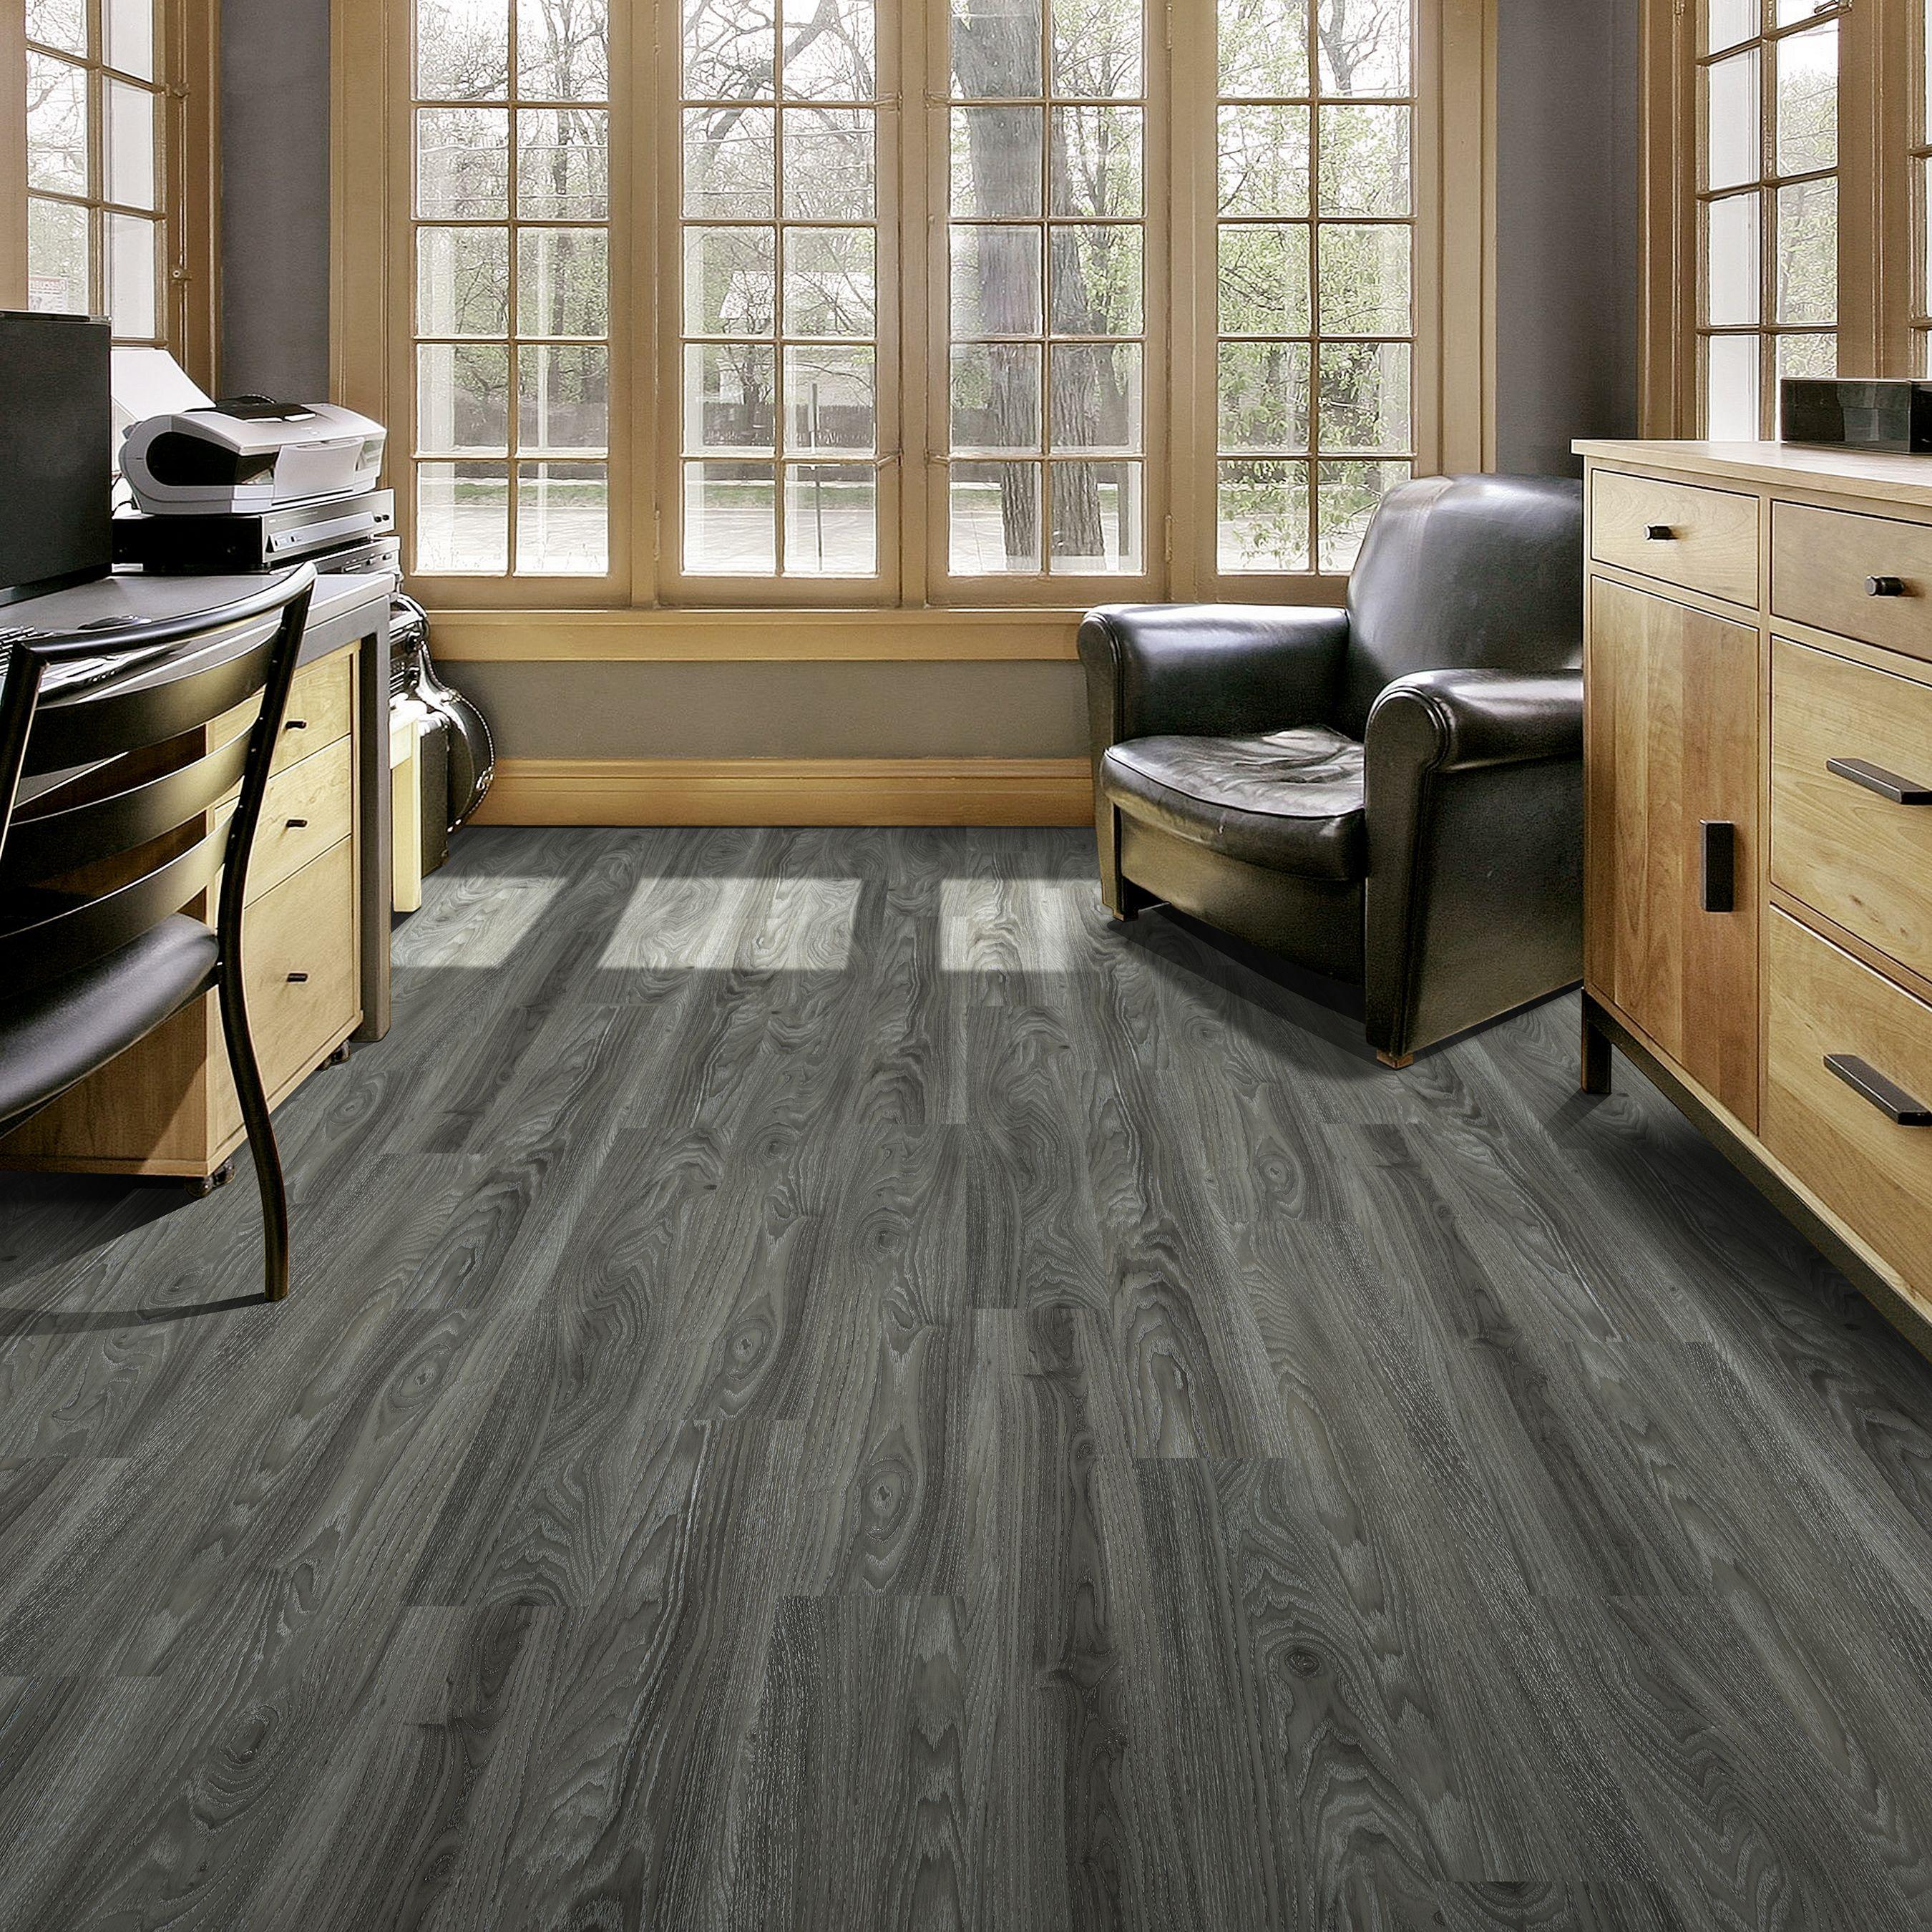 Beaulieu LVTAvenues Luxury flooring, Vinyl flooring